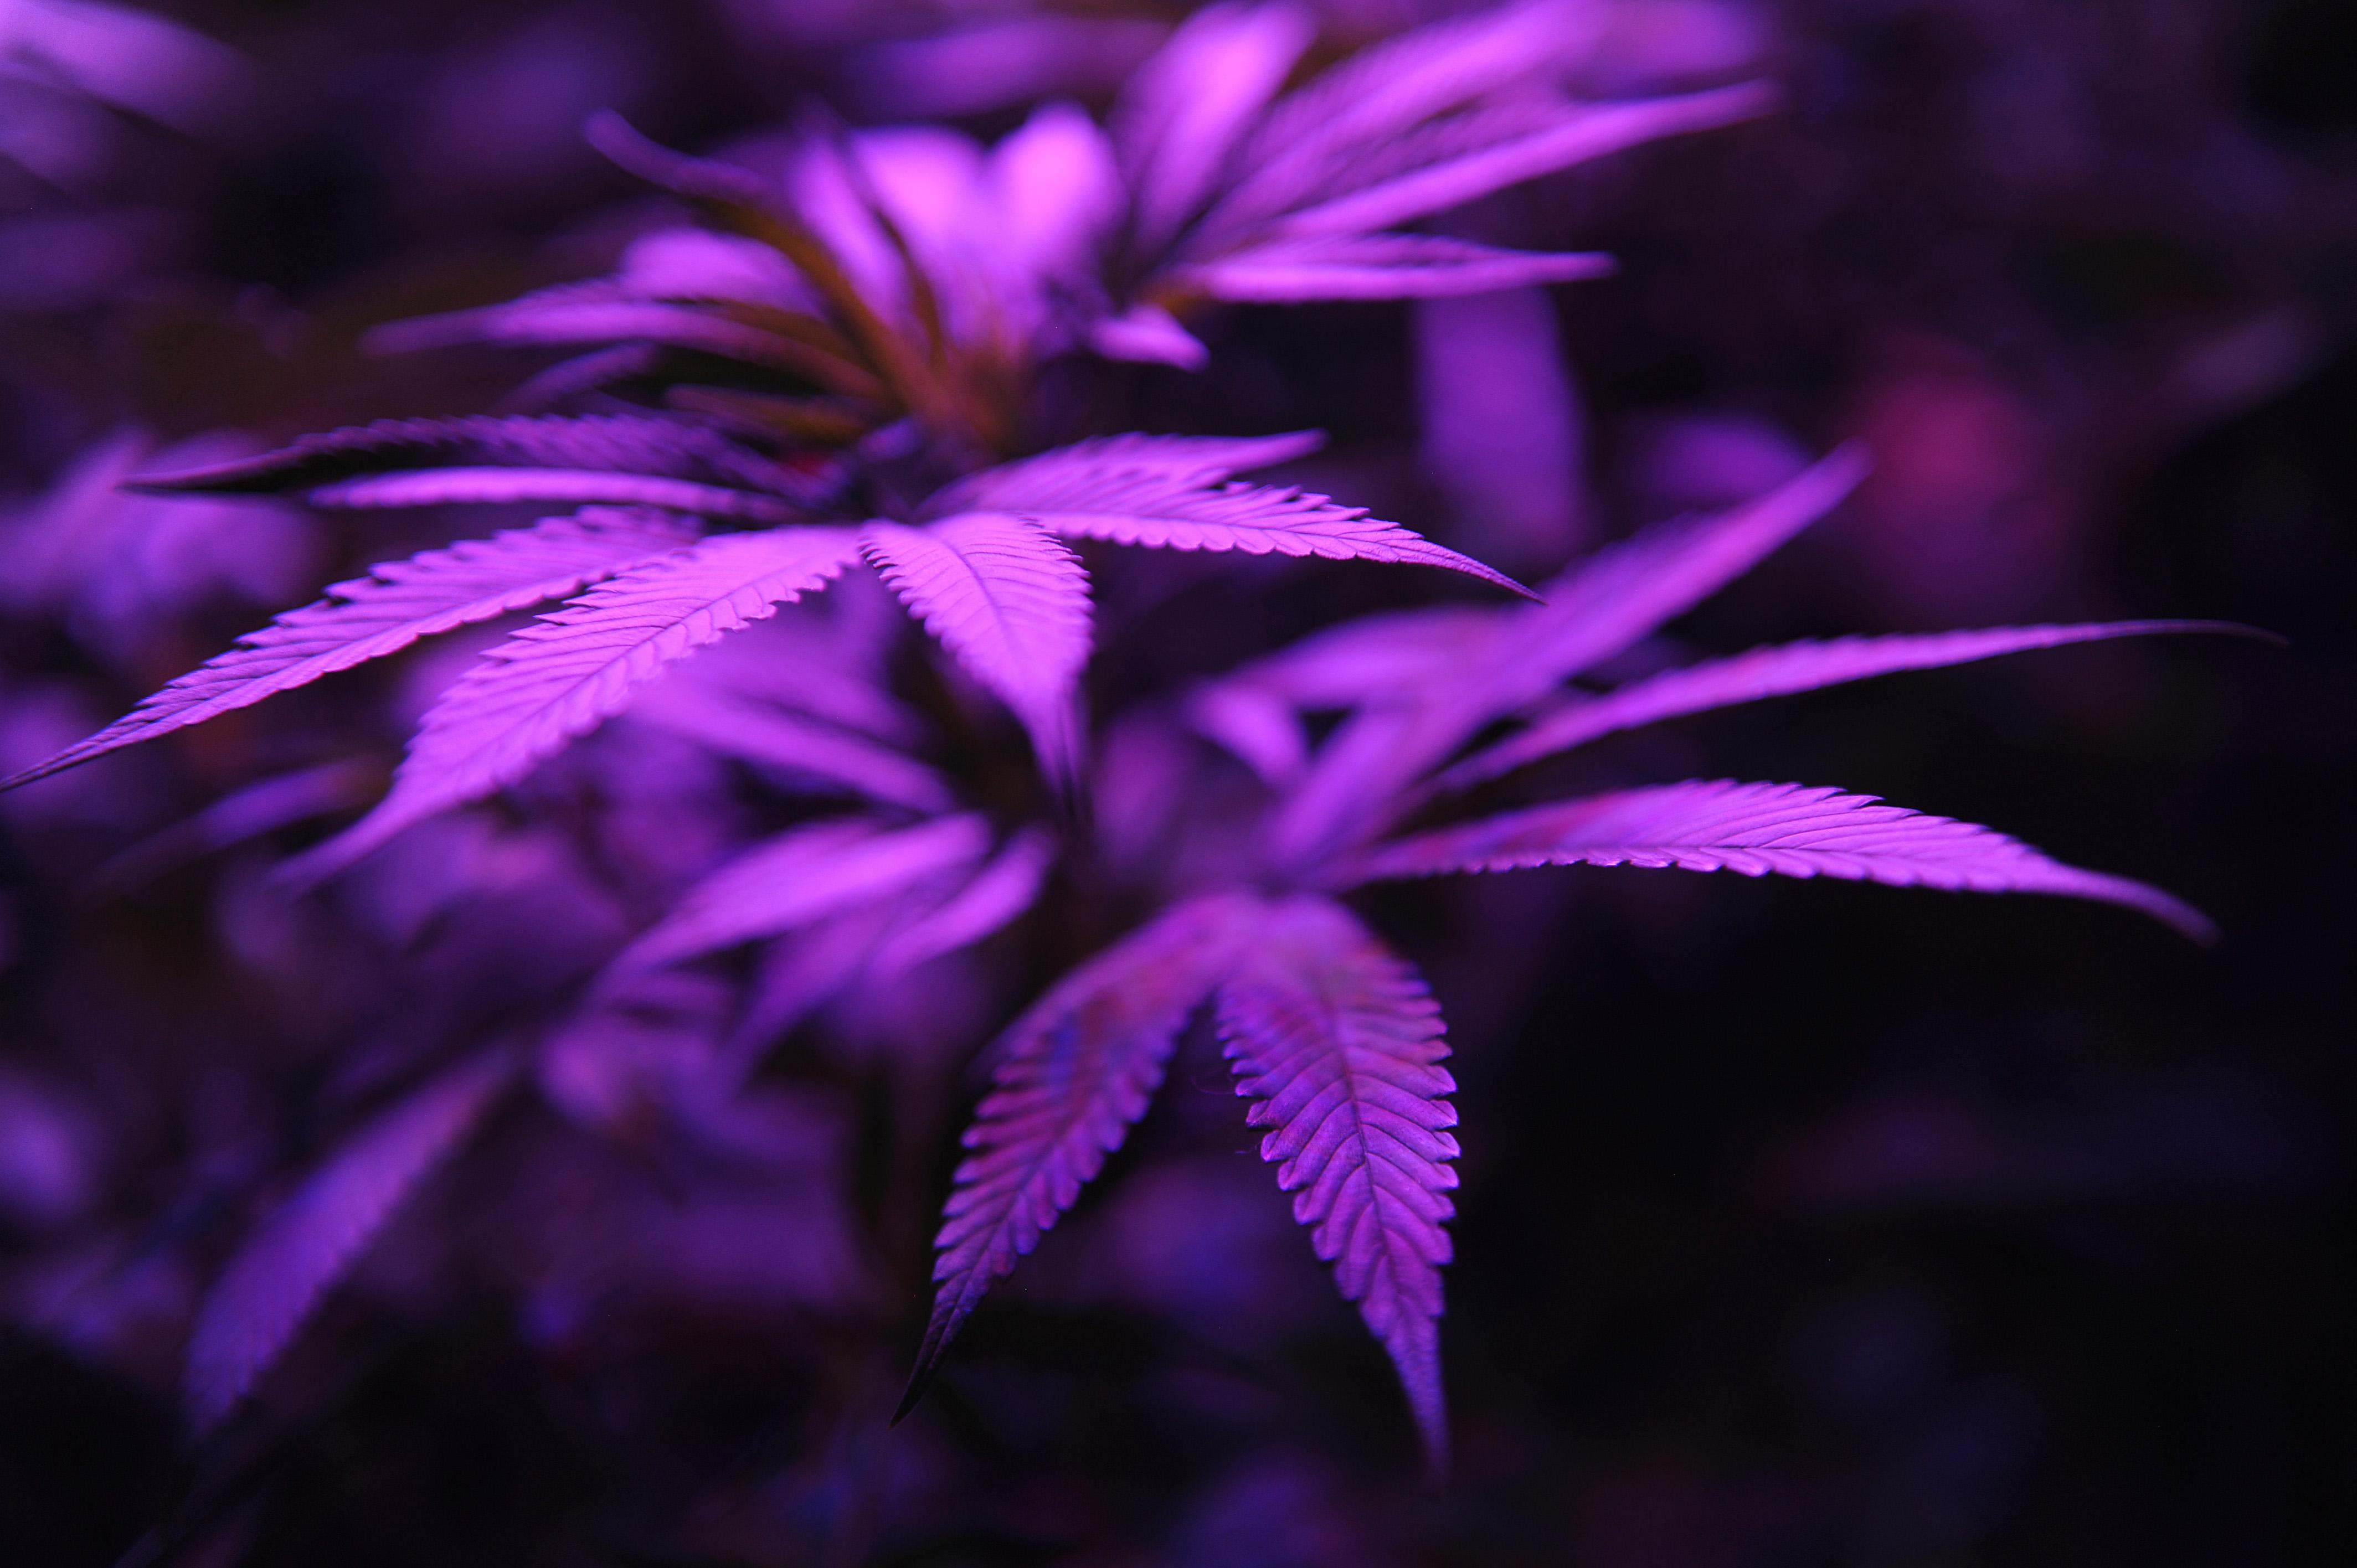 it sure looks like marijuana legalization will make your weed a purple marijuana plants